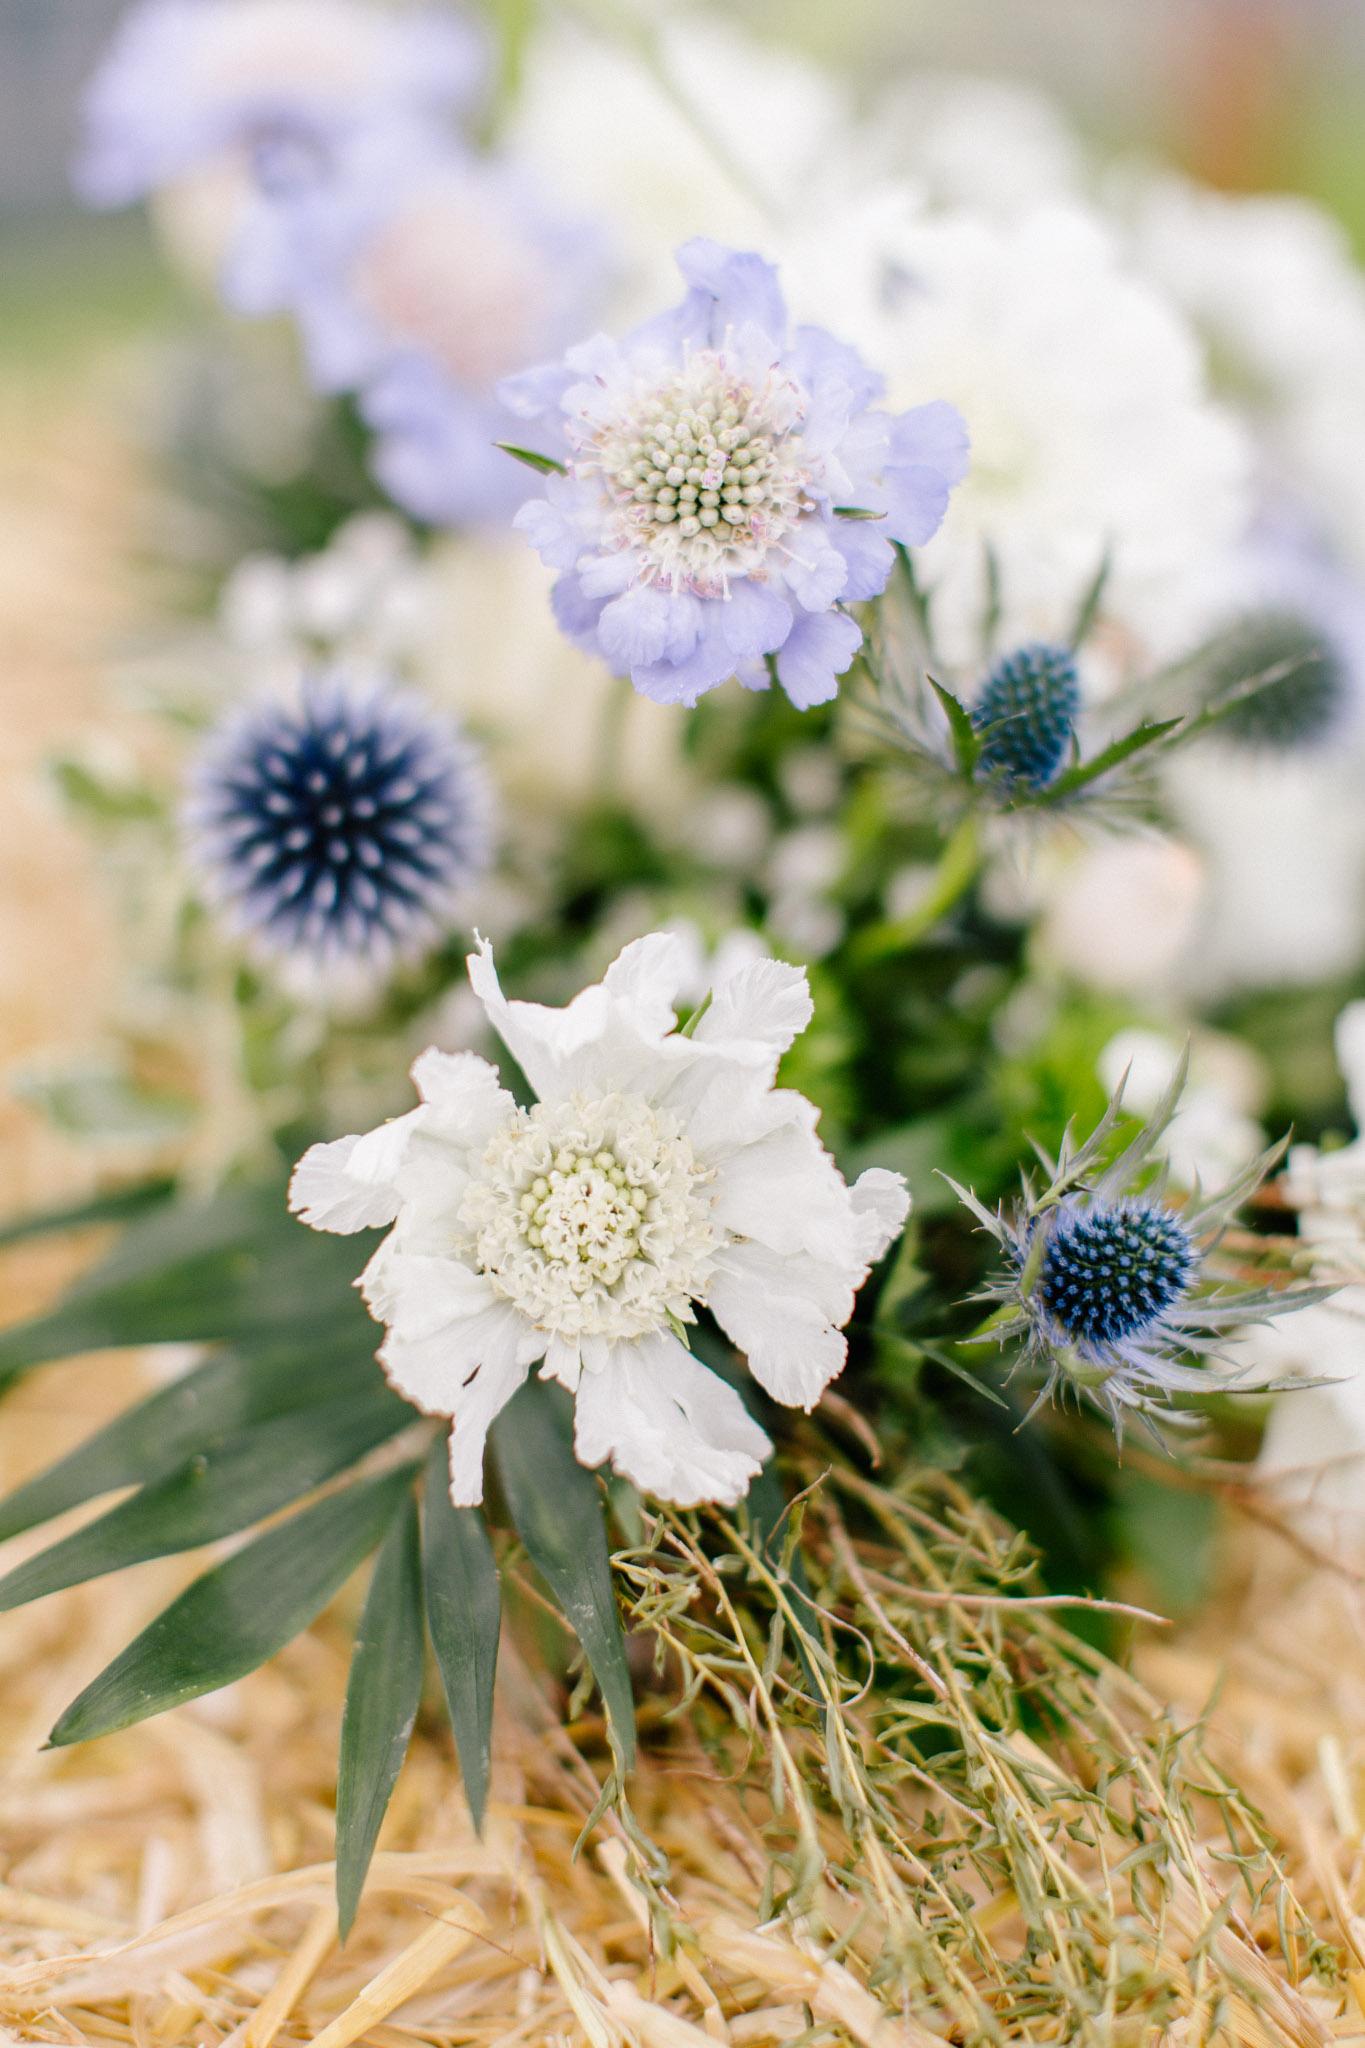 Lenl-Simmental-Buehlerhof-Pia-Anna-Christian-Wedding-Photography-EK-68.jpg